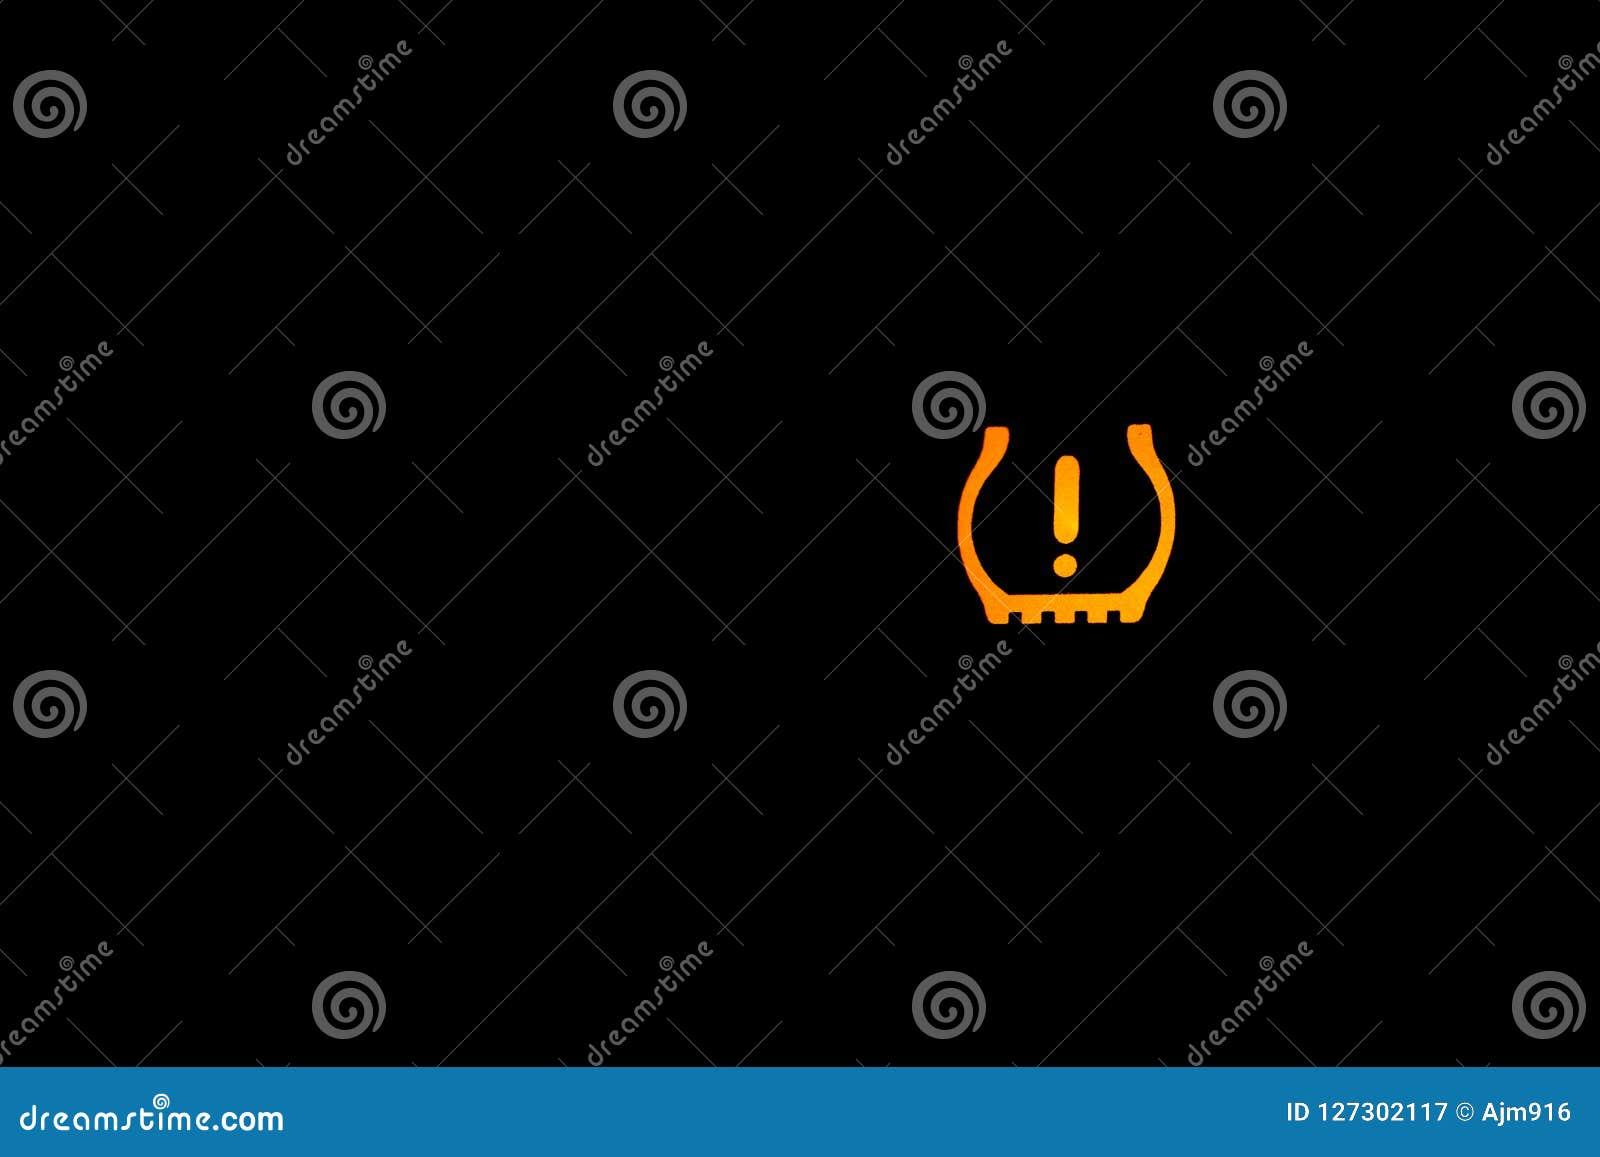 Tire Pressure Warning Light Sign Car Light Indicator Yellow Indoor